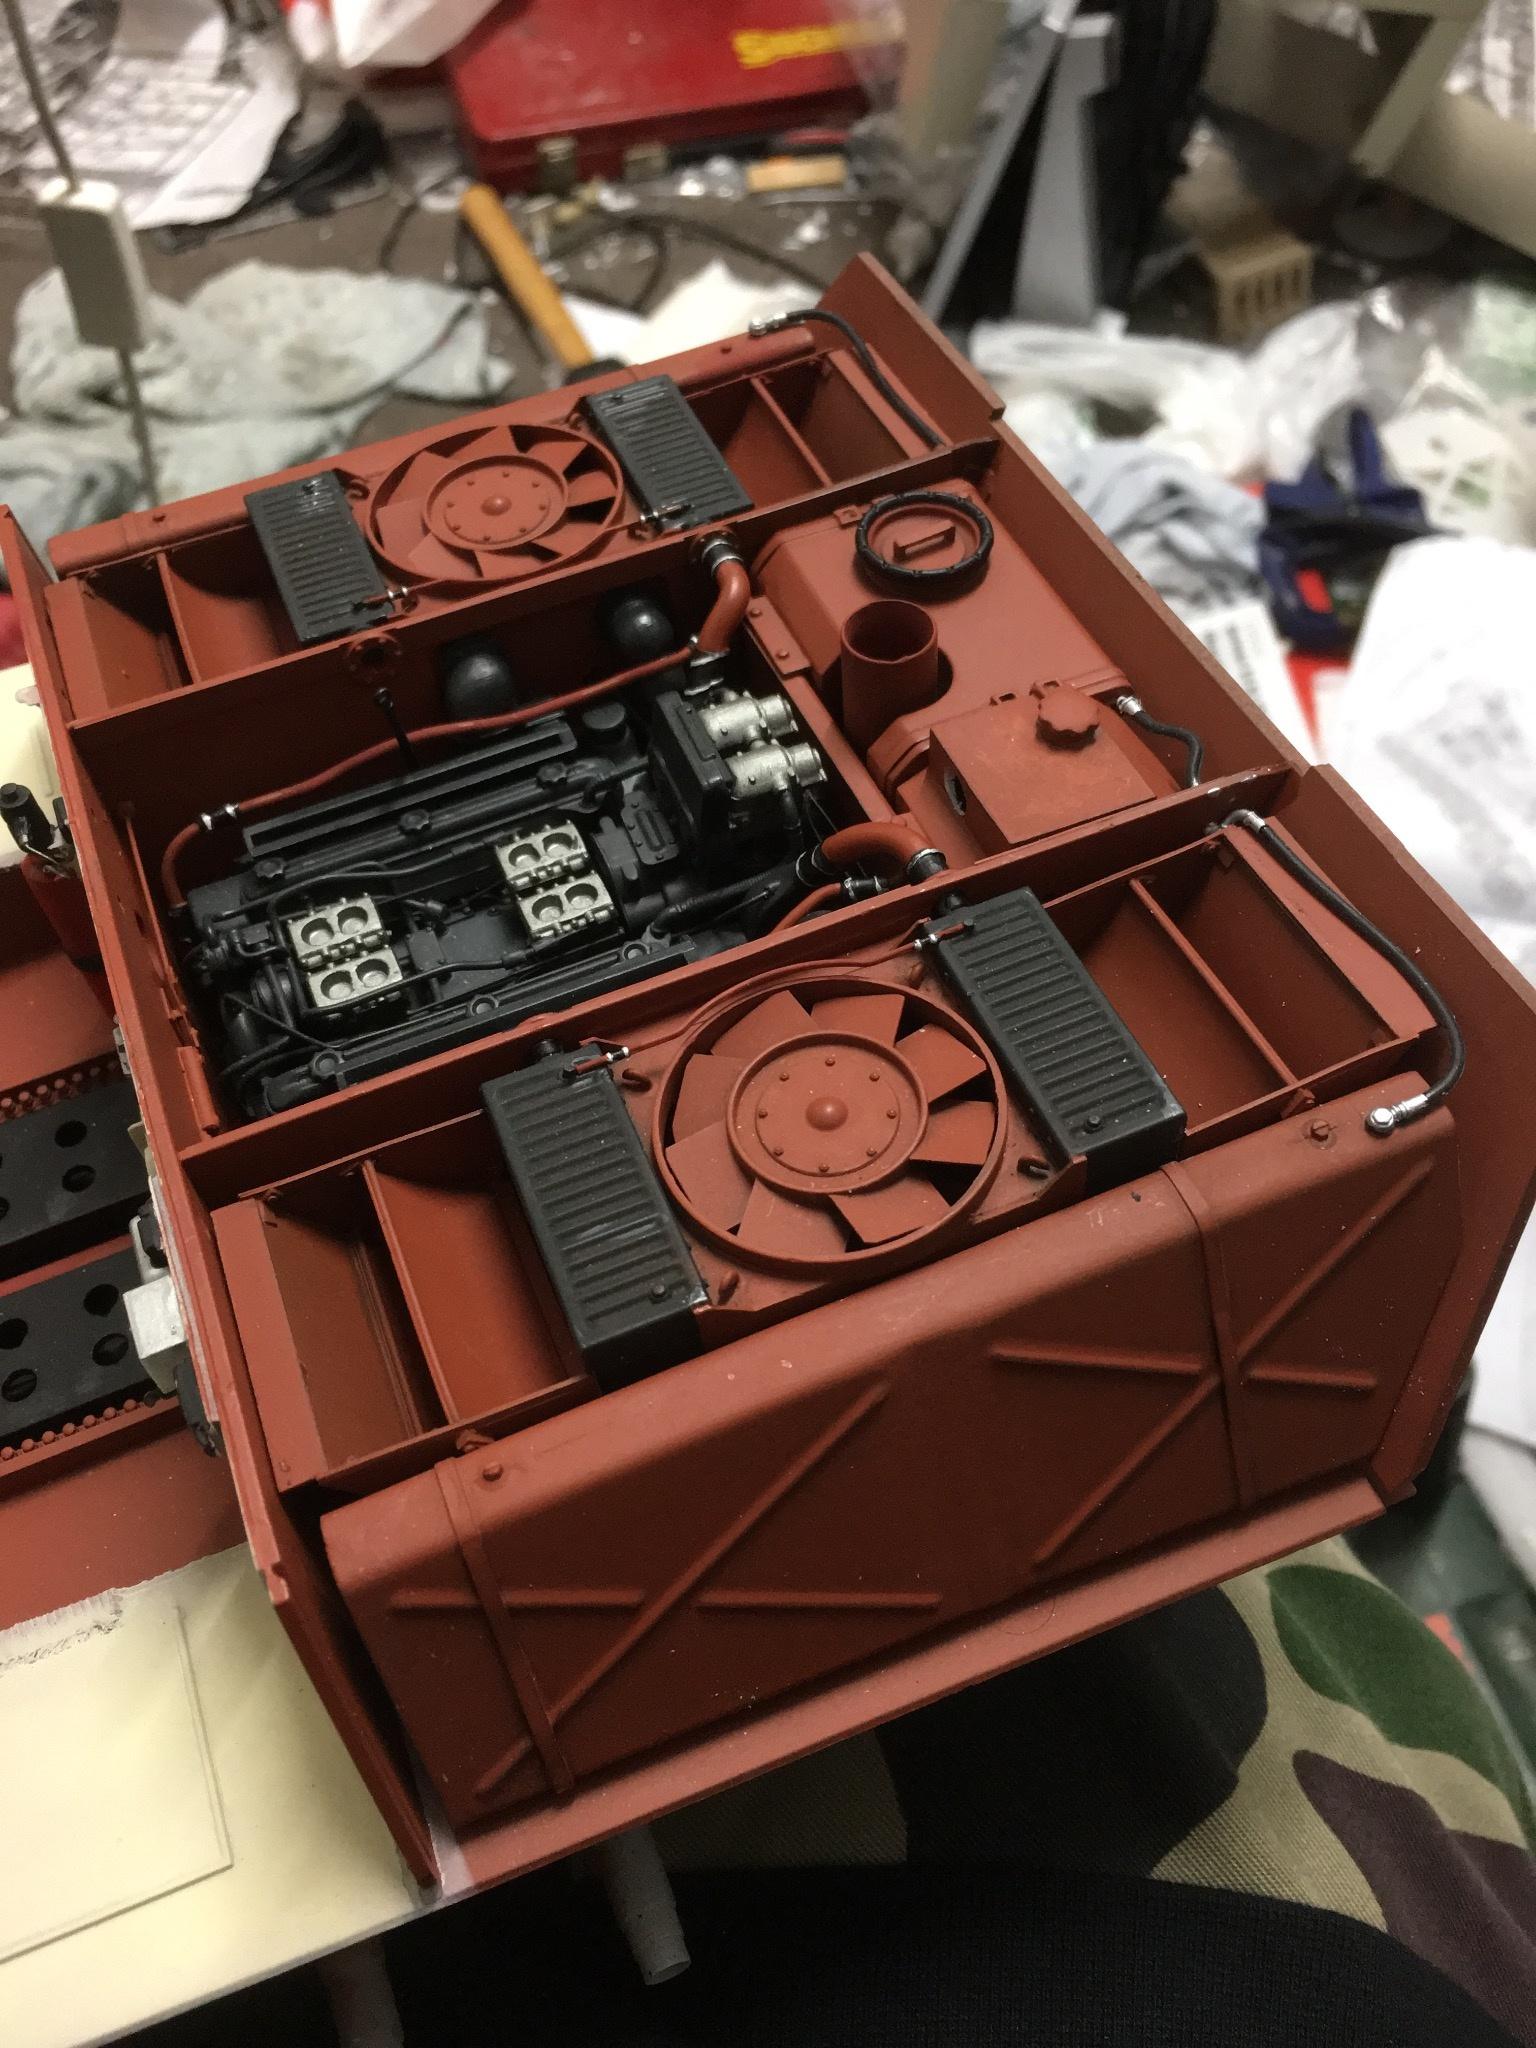 E76E005B-2A1C-4B22-BC6F-ADD8ACD4C5AB.jpeg